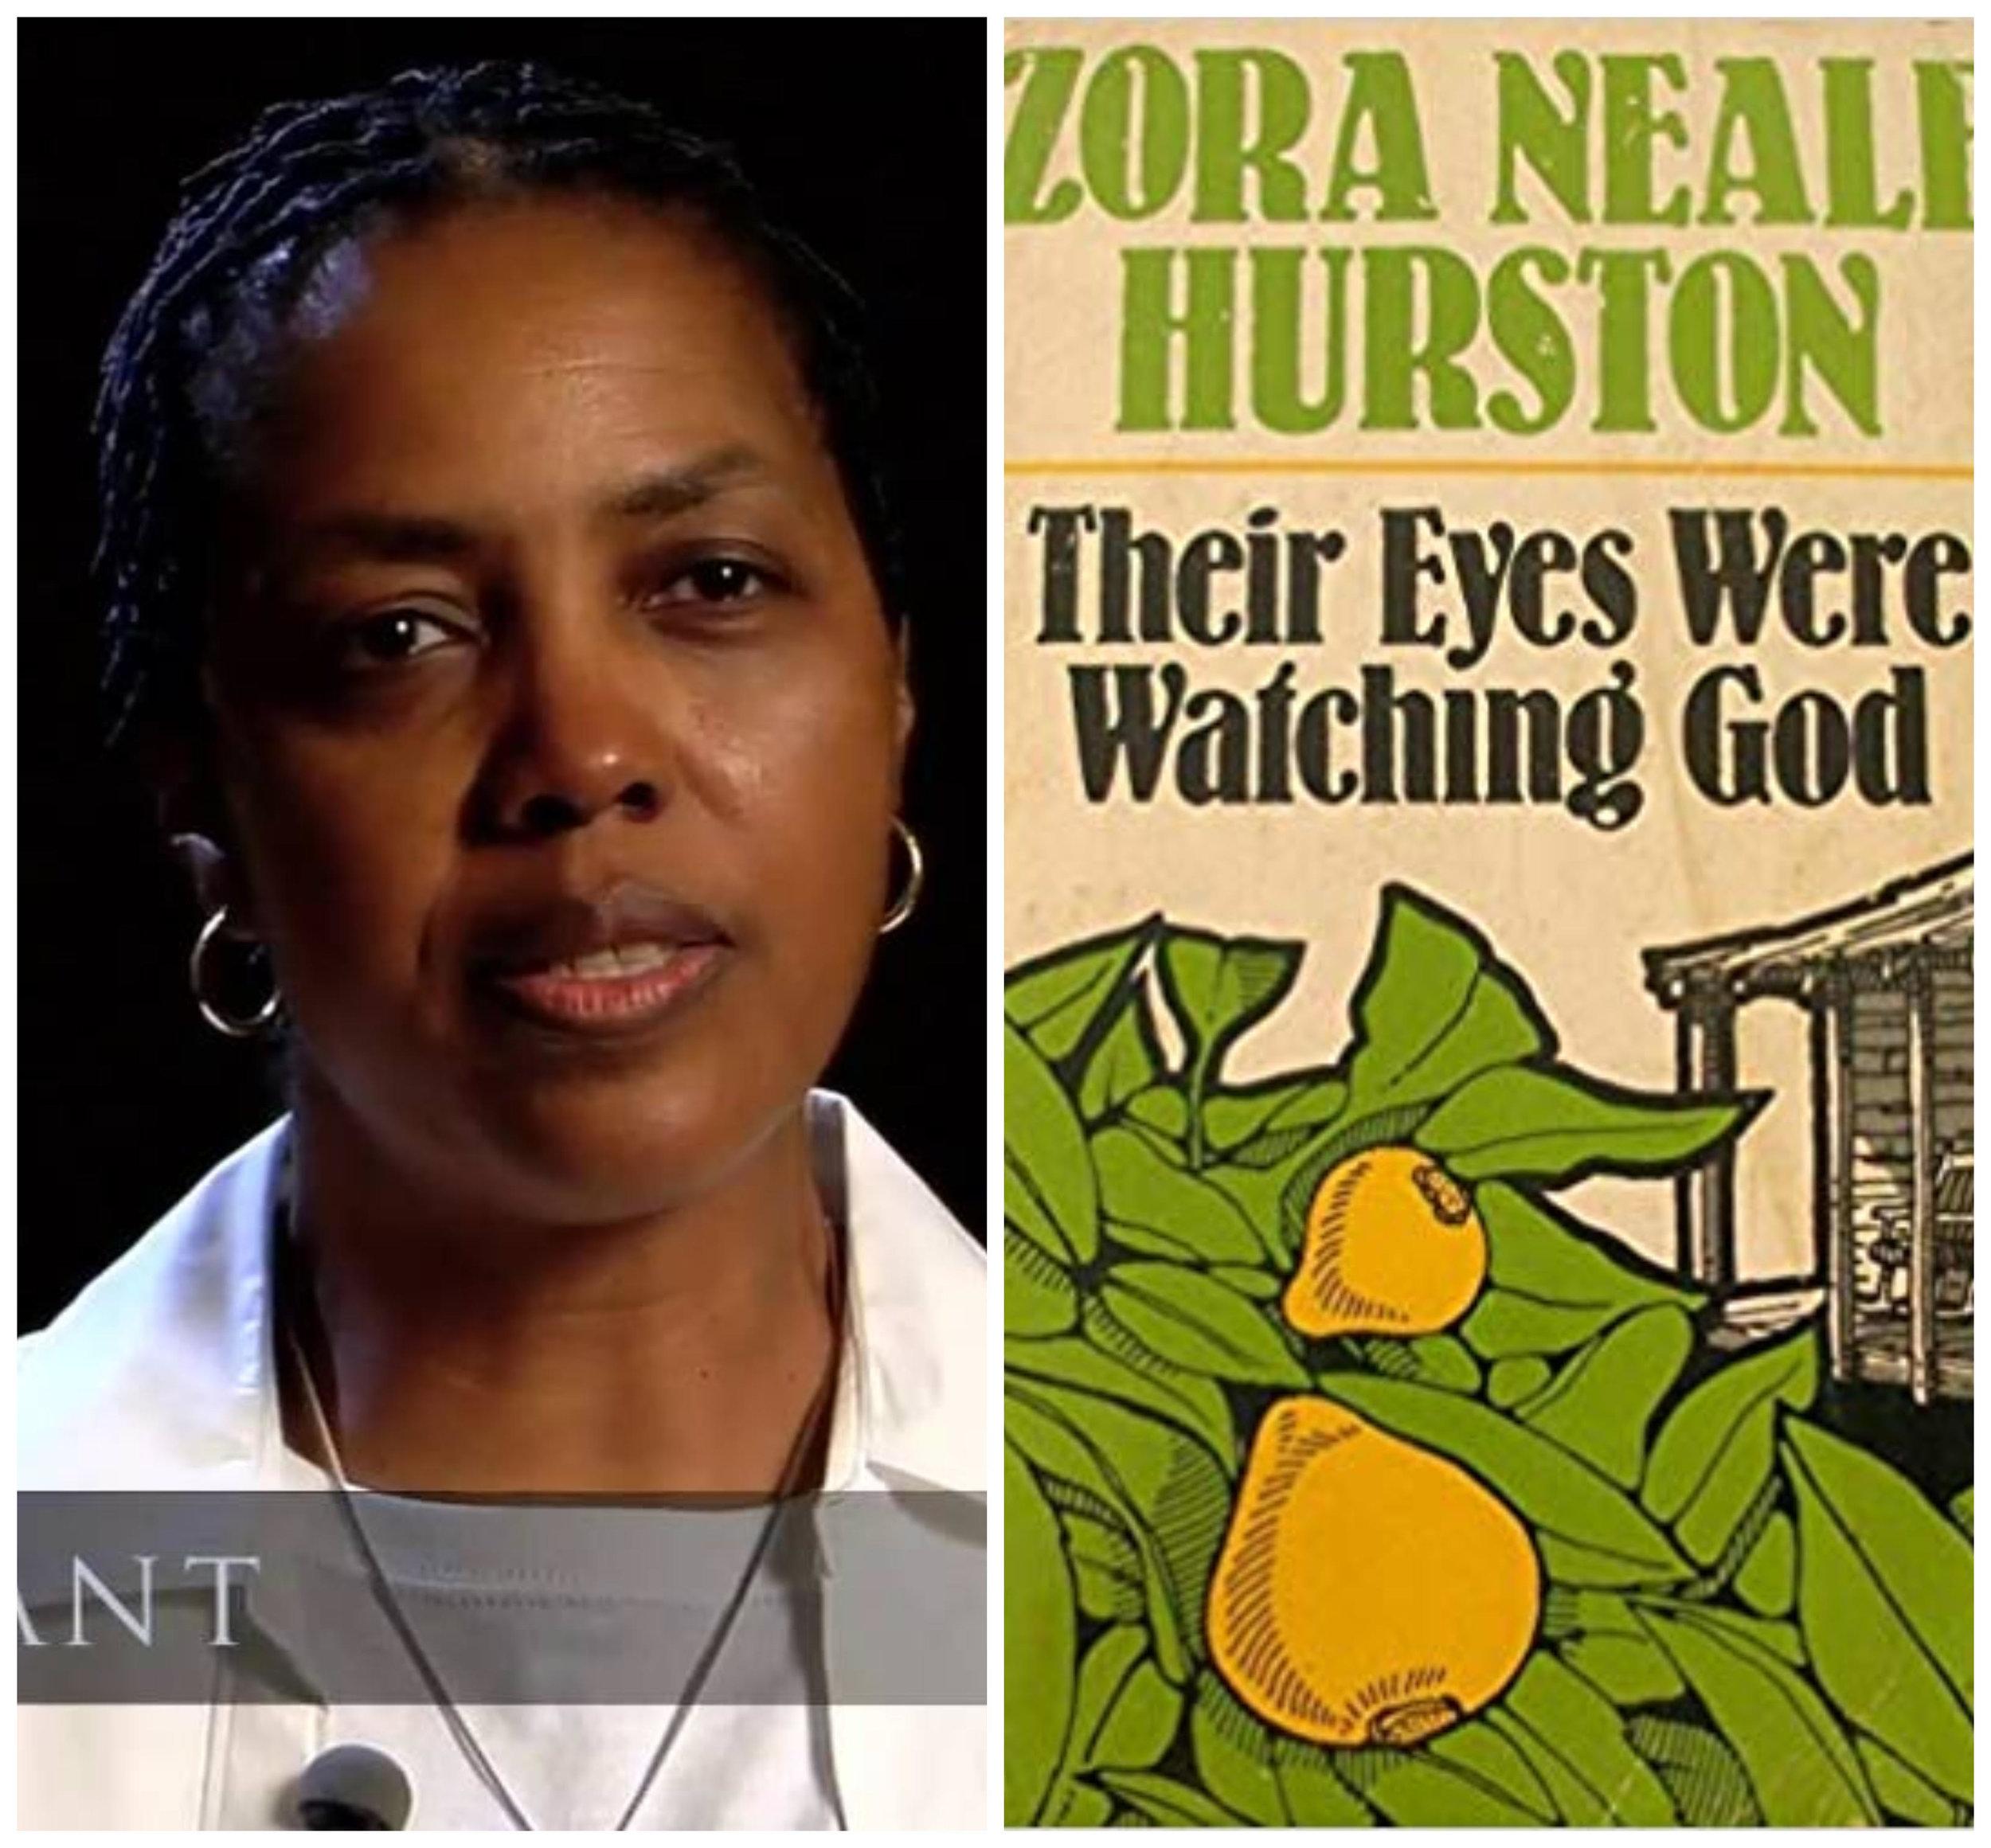 GREAT BOOKS 11: Zora Neale Hurston's Their Eyes Were Watching God, with Deborah Plant -